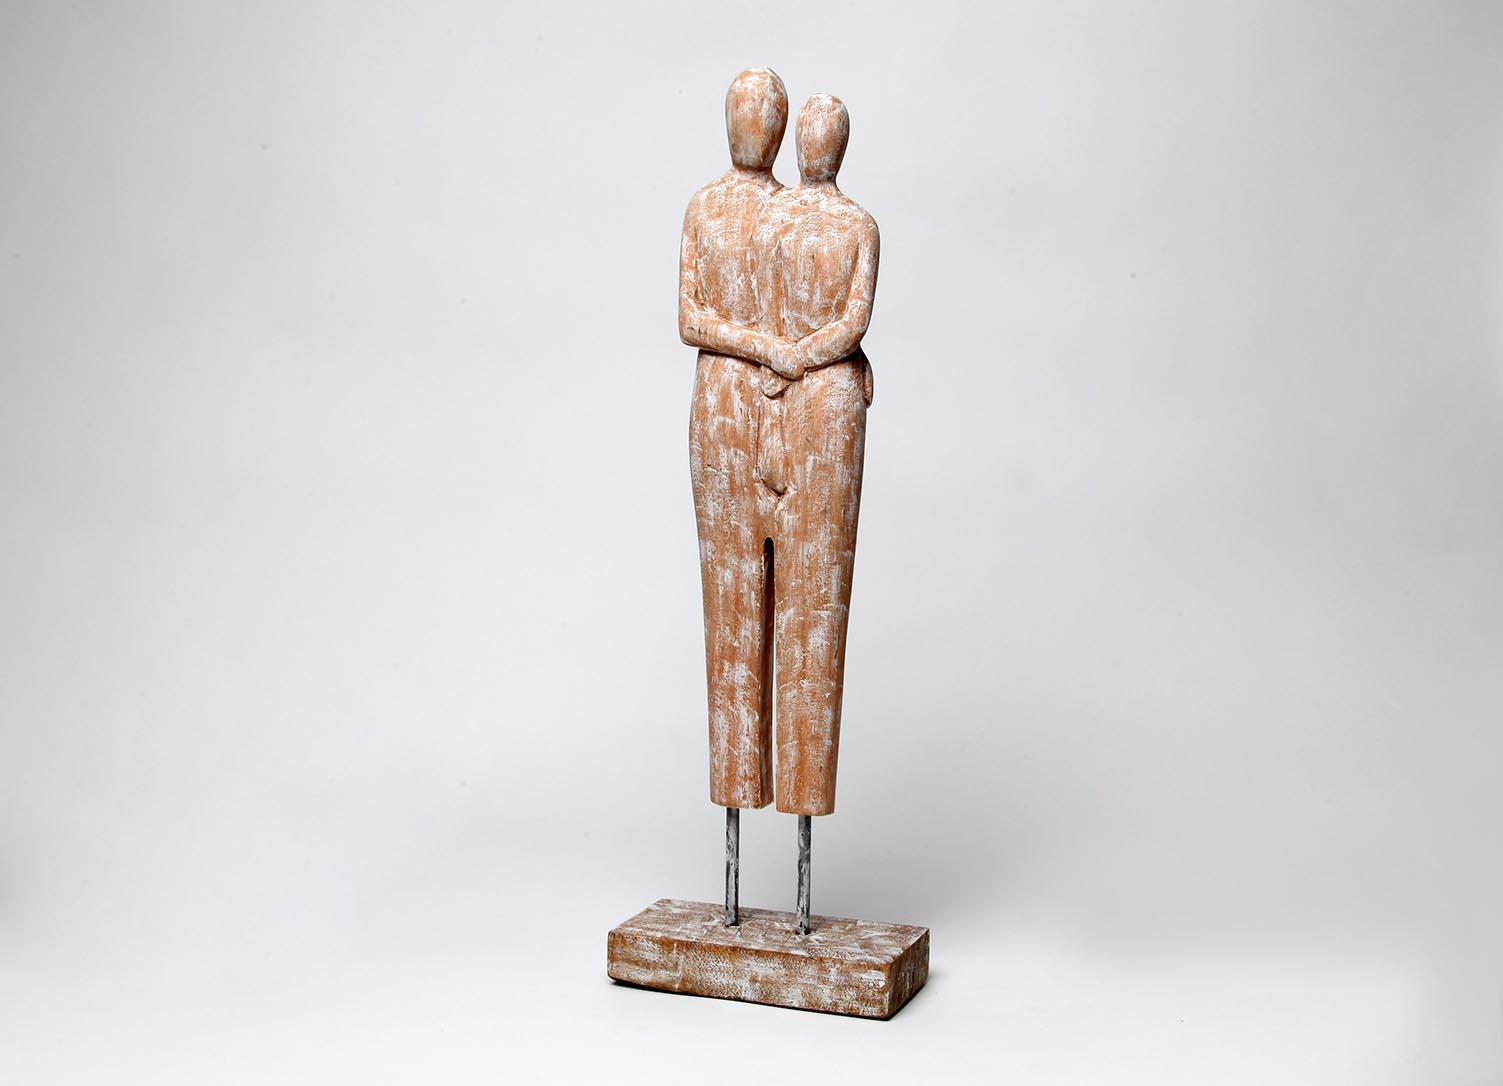 Exner Skulptur  Paar Artisanal, Holz, 18x9x56 cm